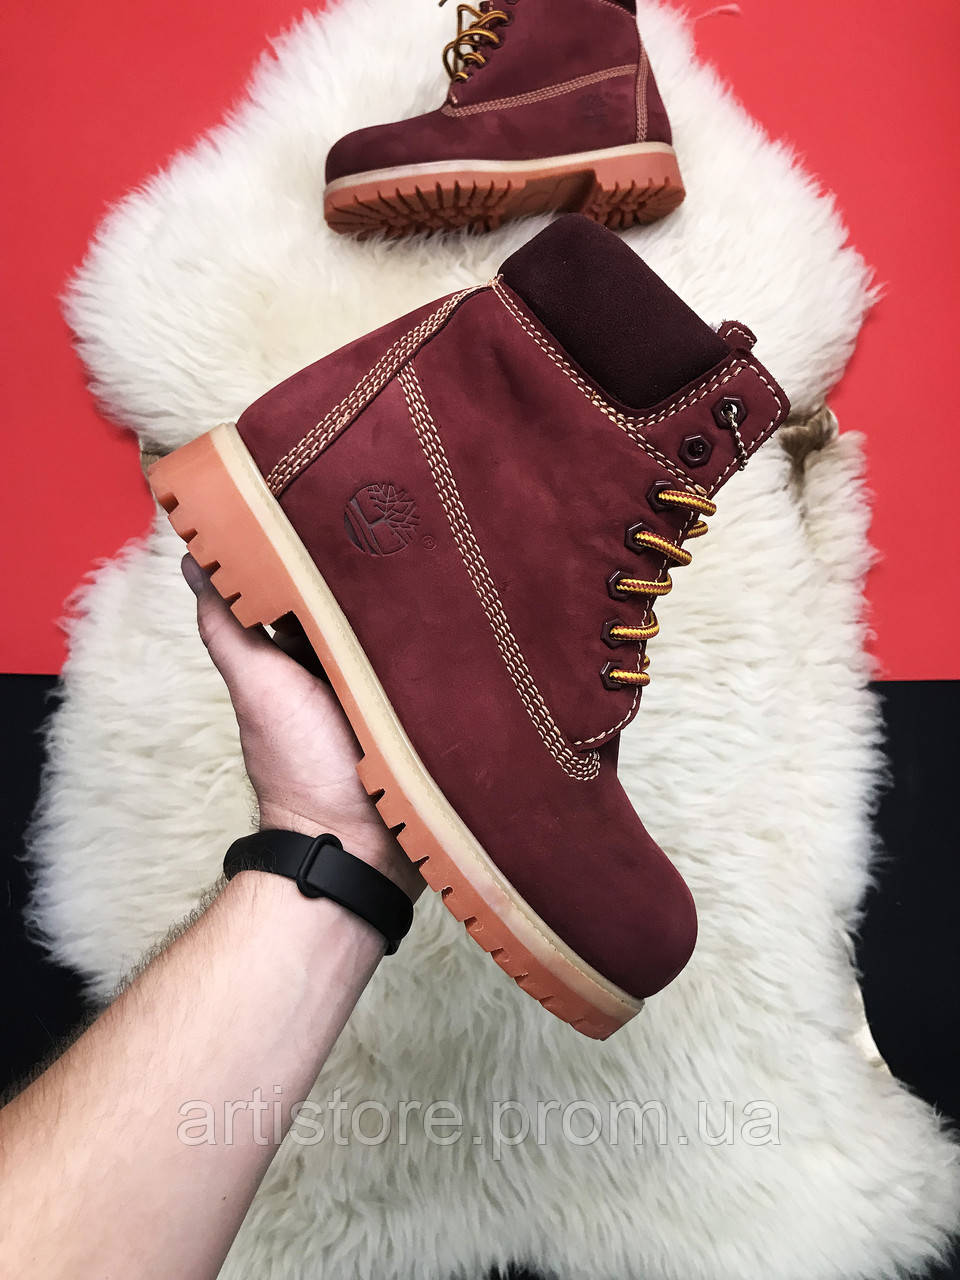 Timberland Bordo Fure Premium